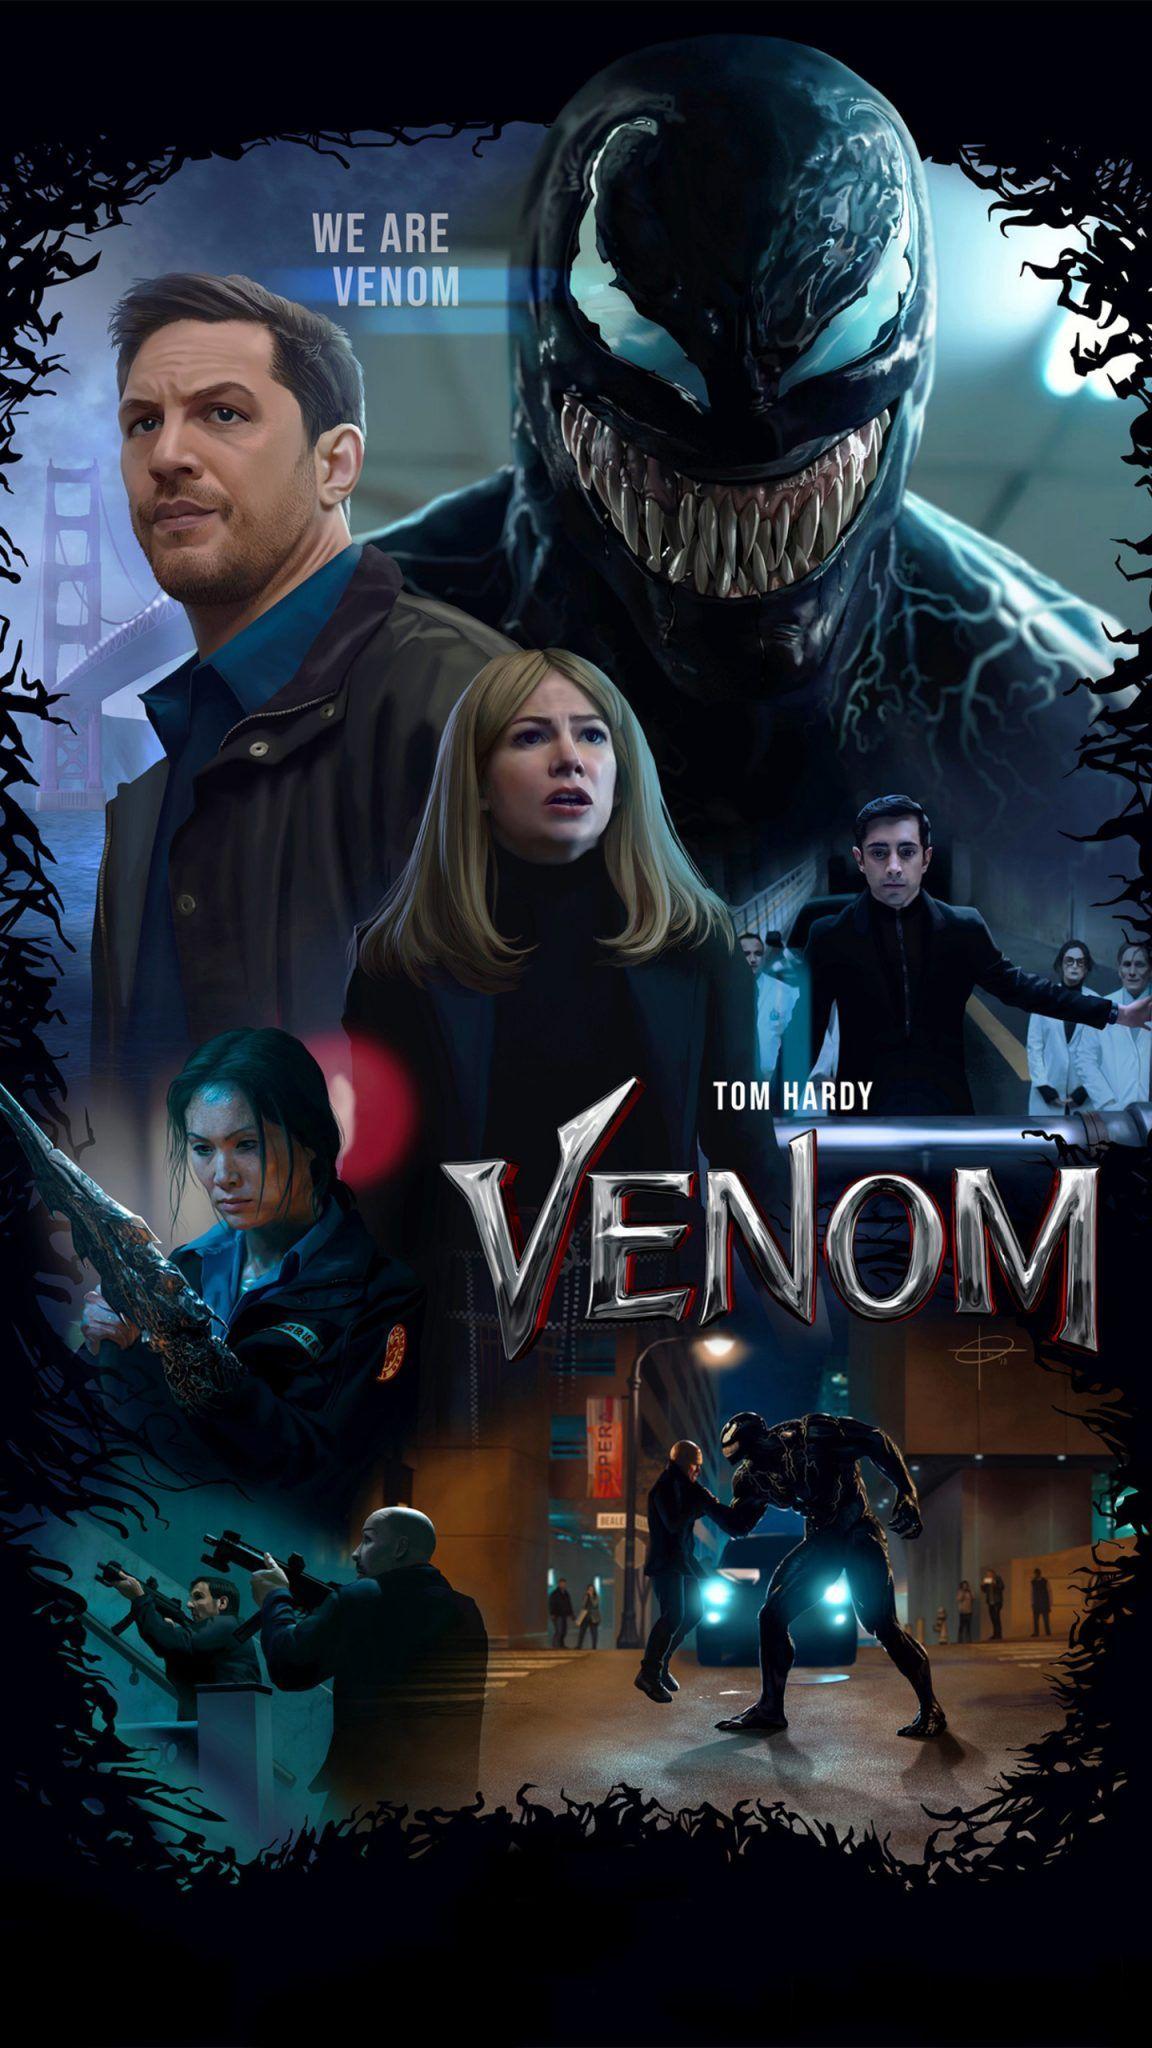 TOP VENOM WALLPAPERS FOR YOUR PINTEREST BOARDS #venom # ...